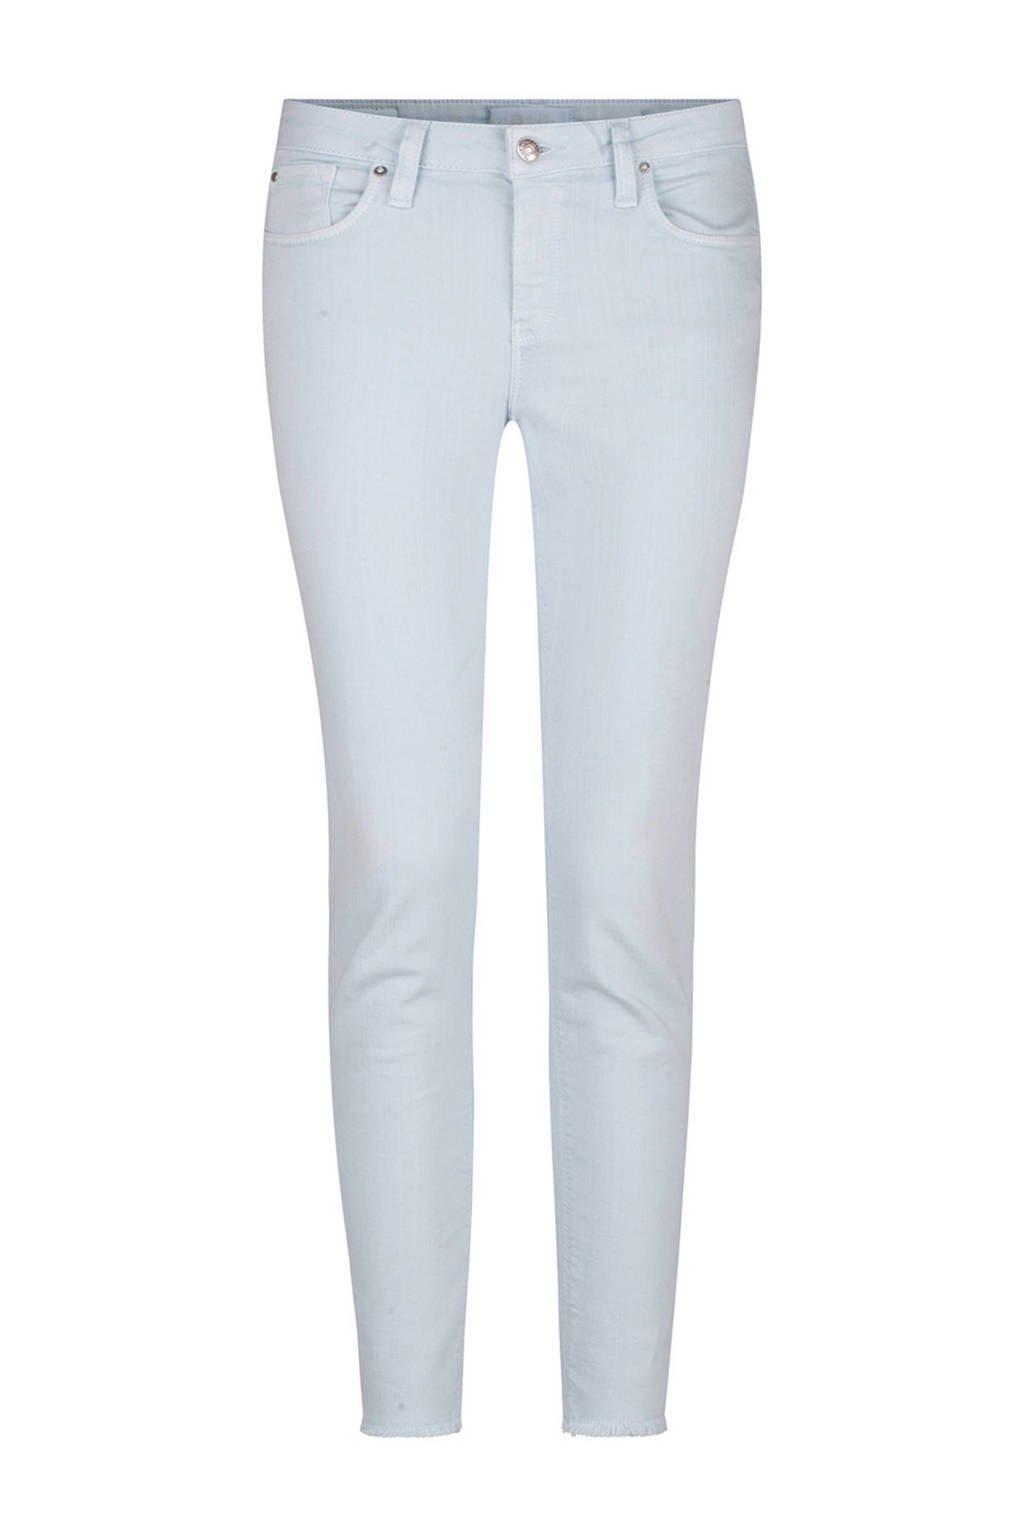 WE Fashion Blue Ridge cropped skinny fit broek, Mintgroen